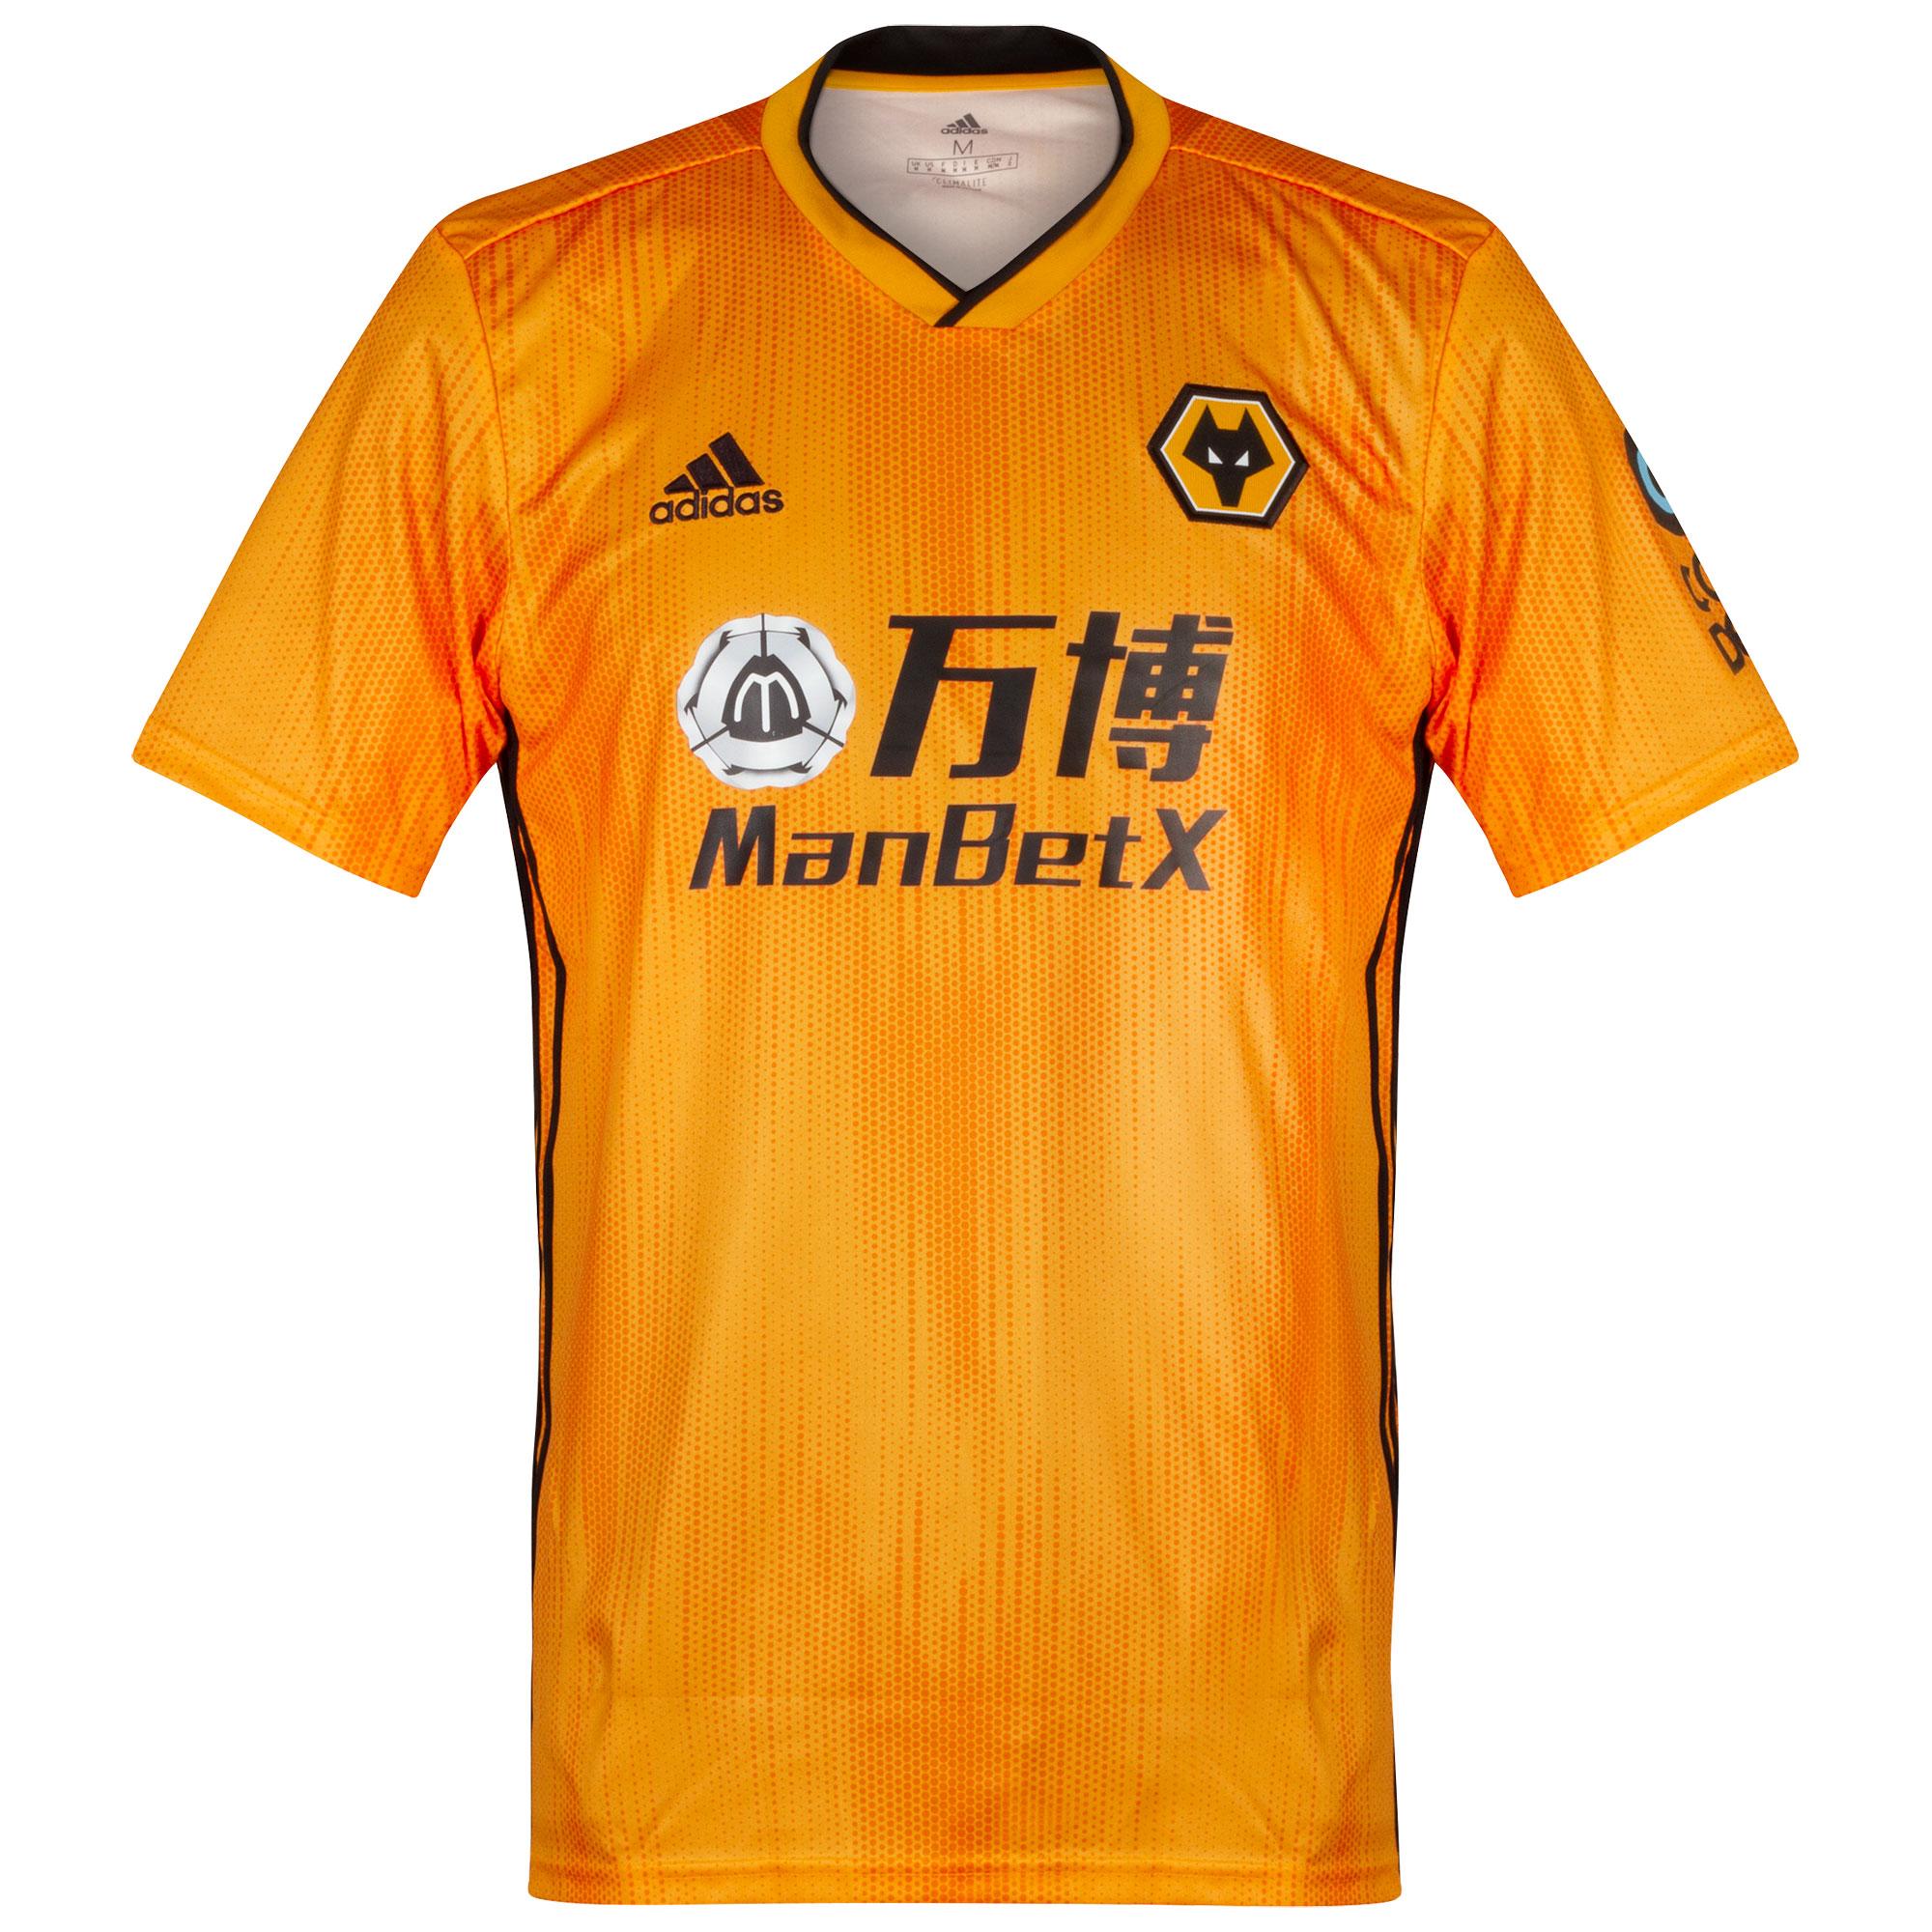 Wolverhampton Wanderers home shirt